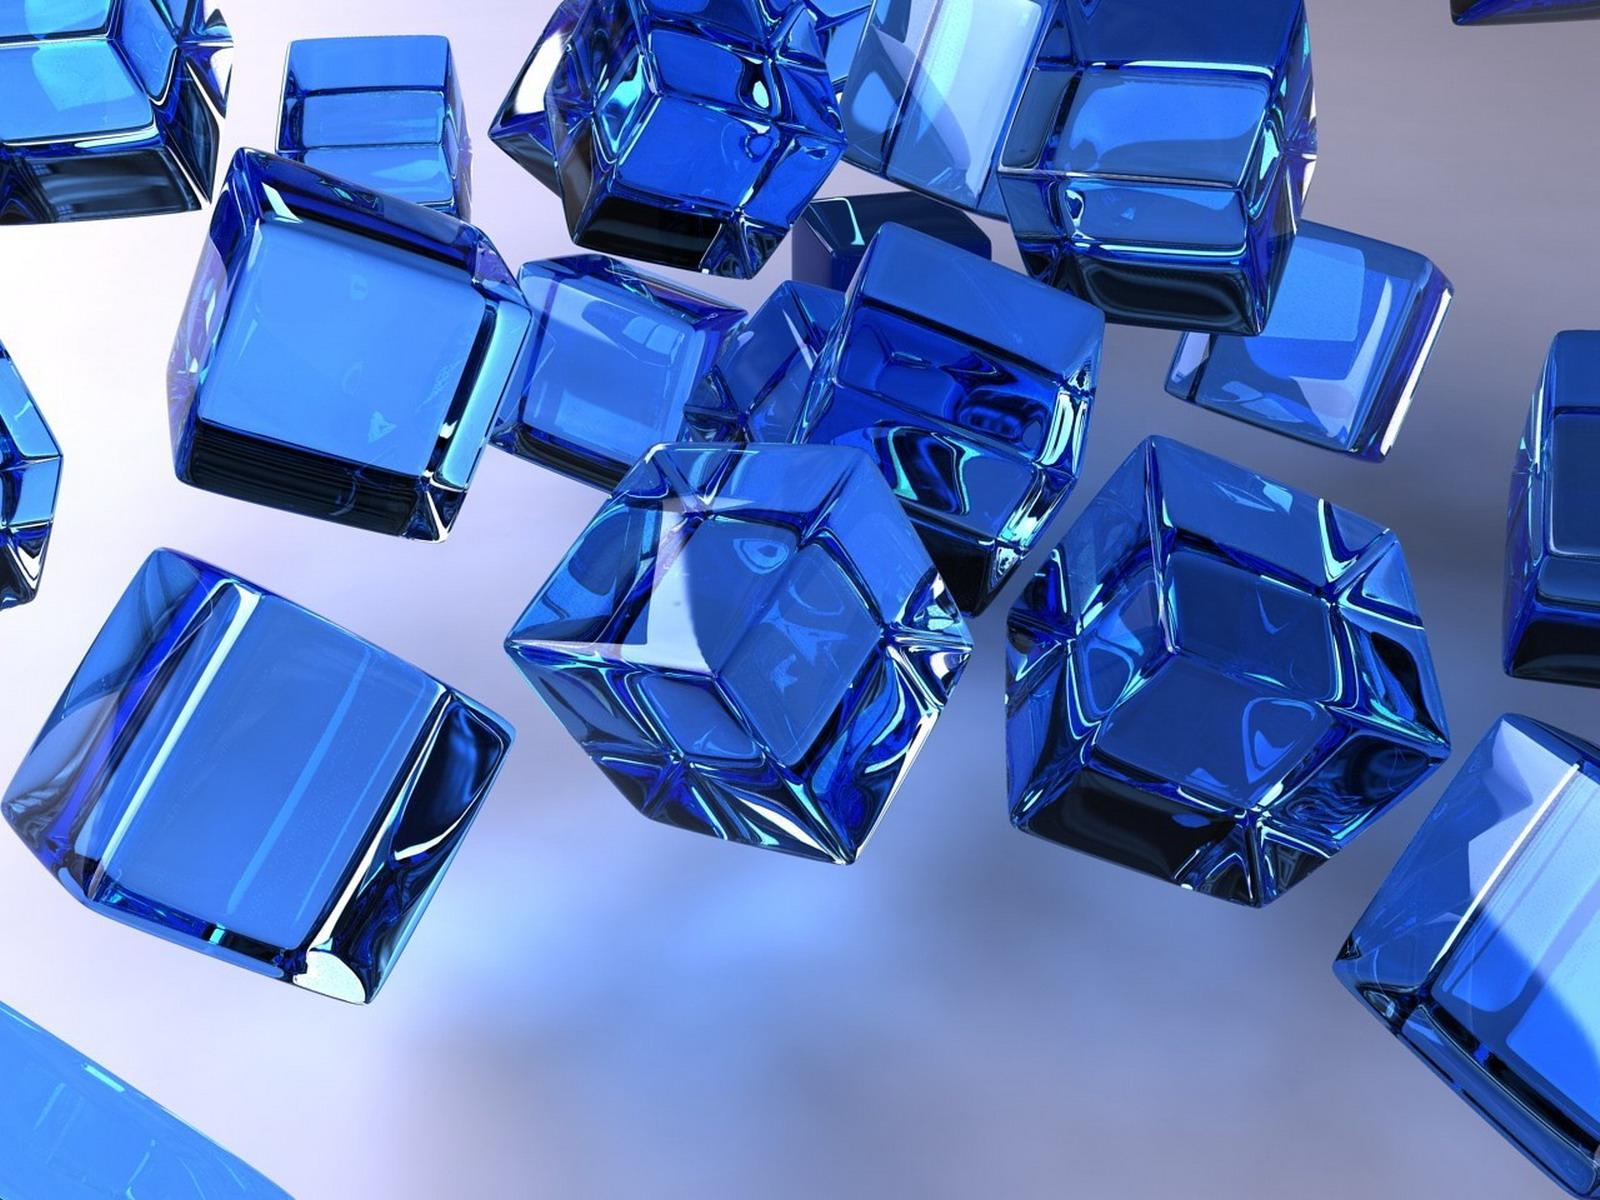 3D Blue Desktop Backgrounds